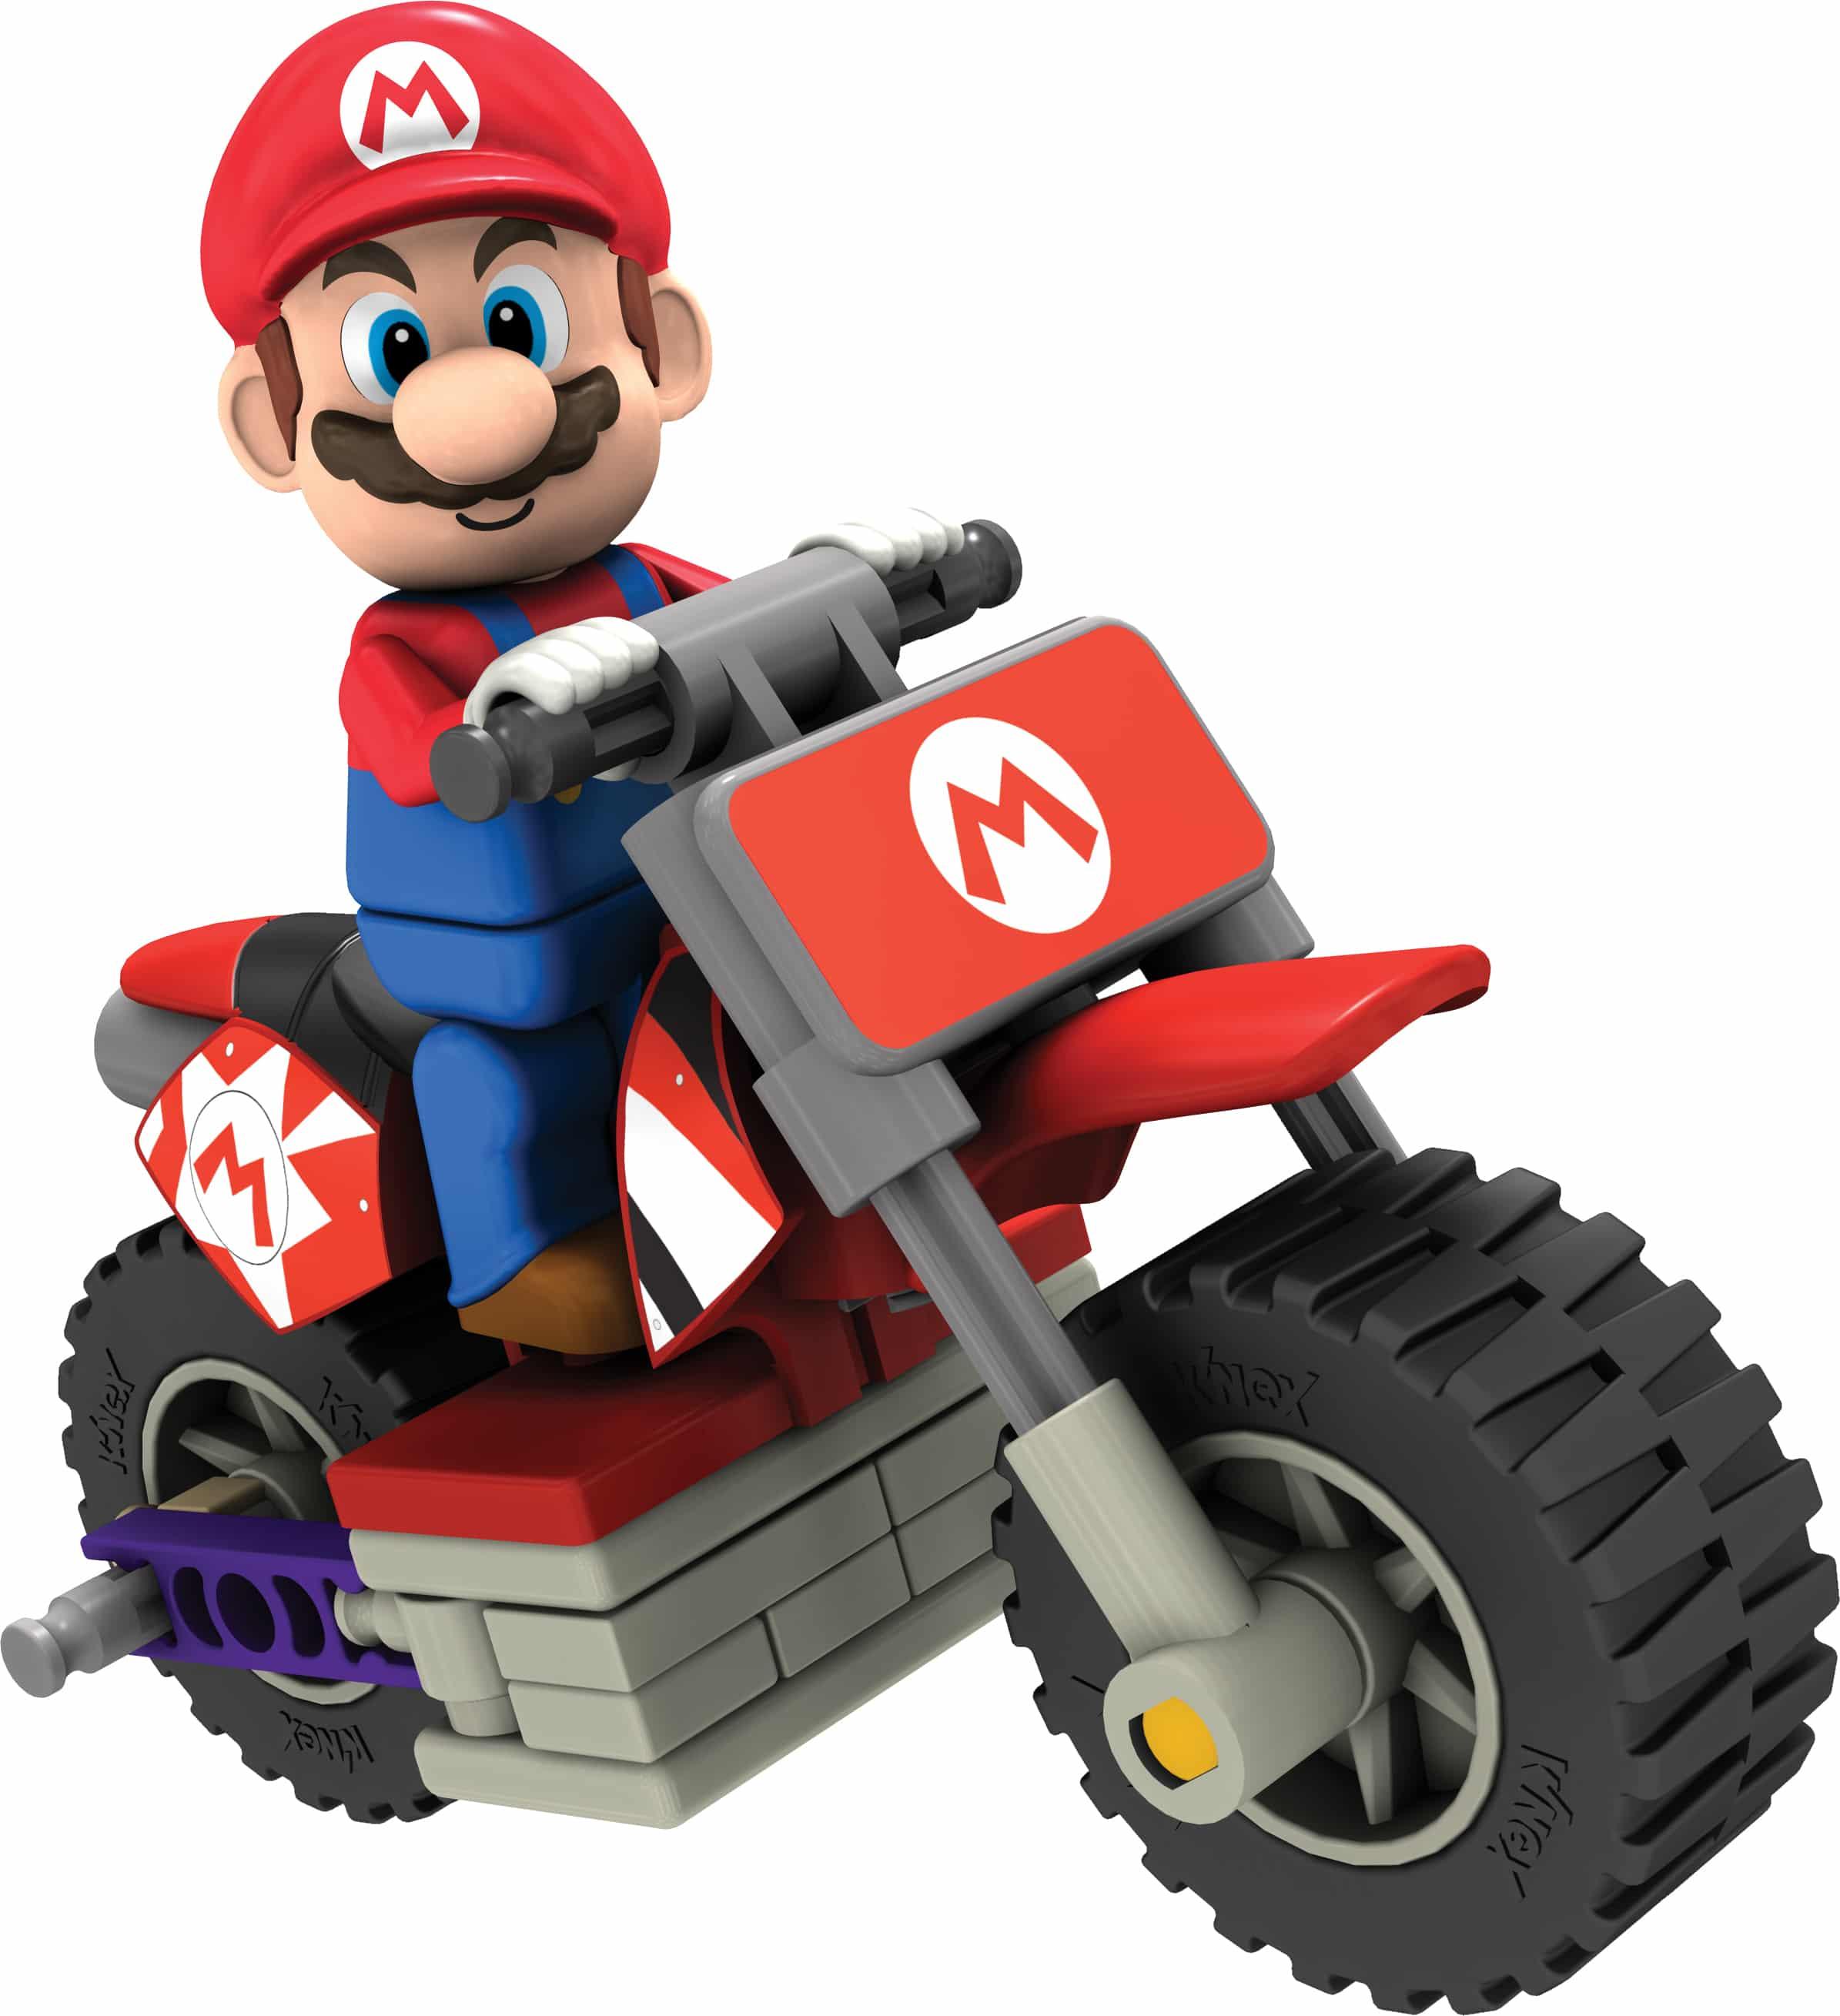 Mario auf seinem Standard Bike (Foto: BOTI)